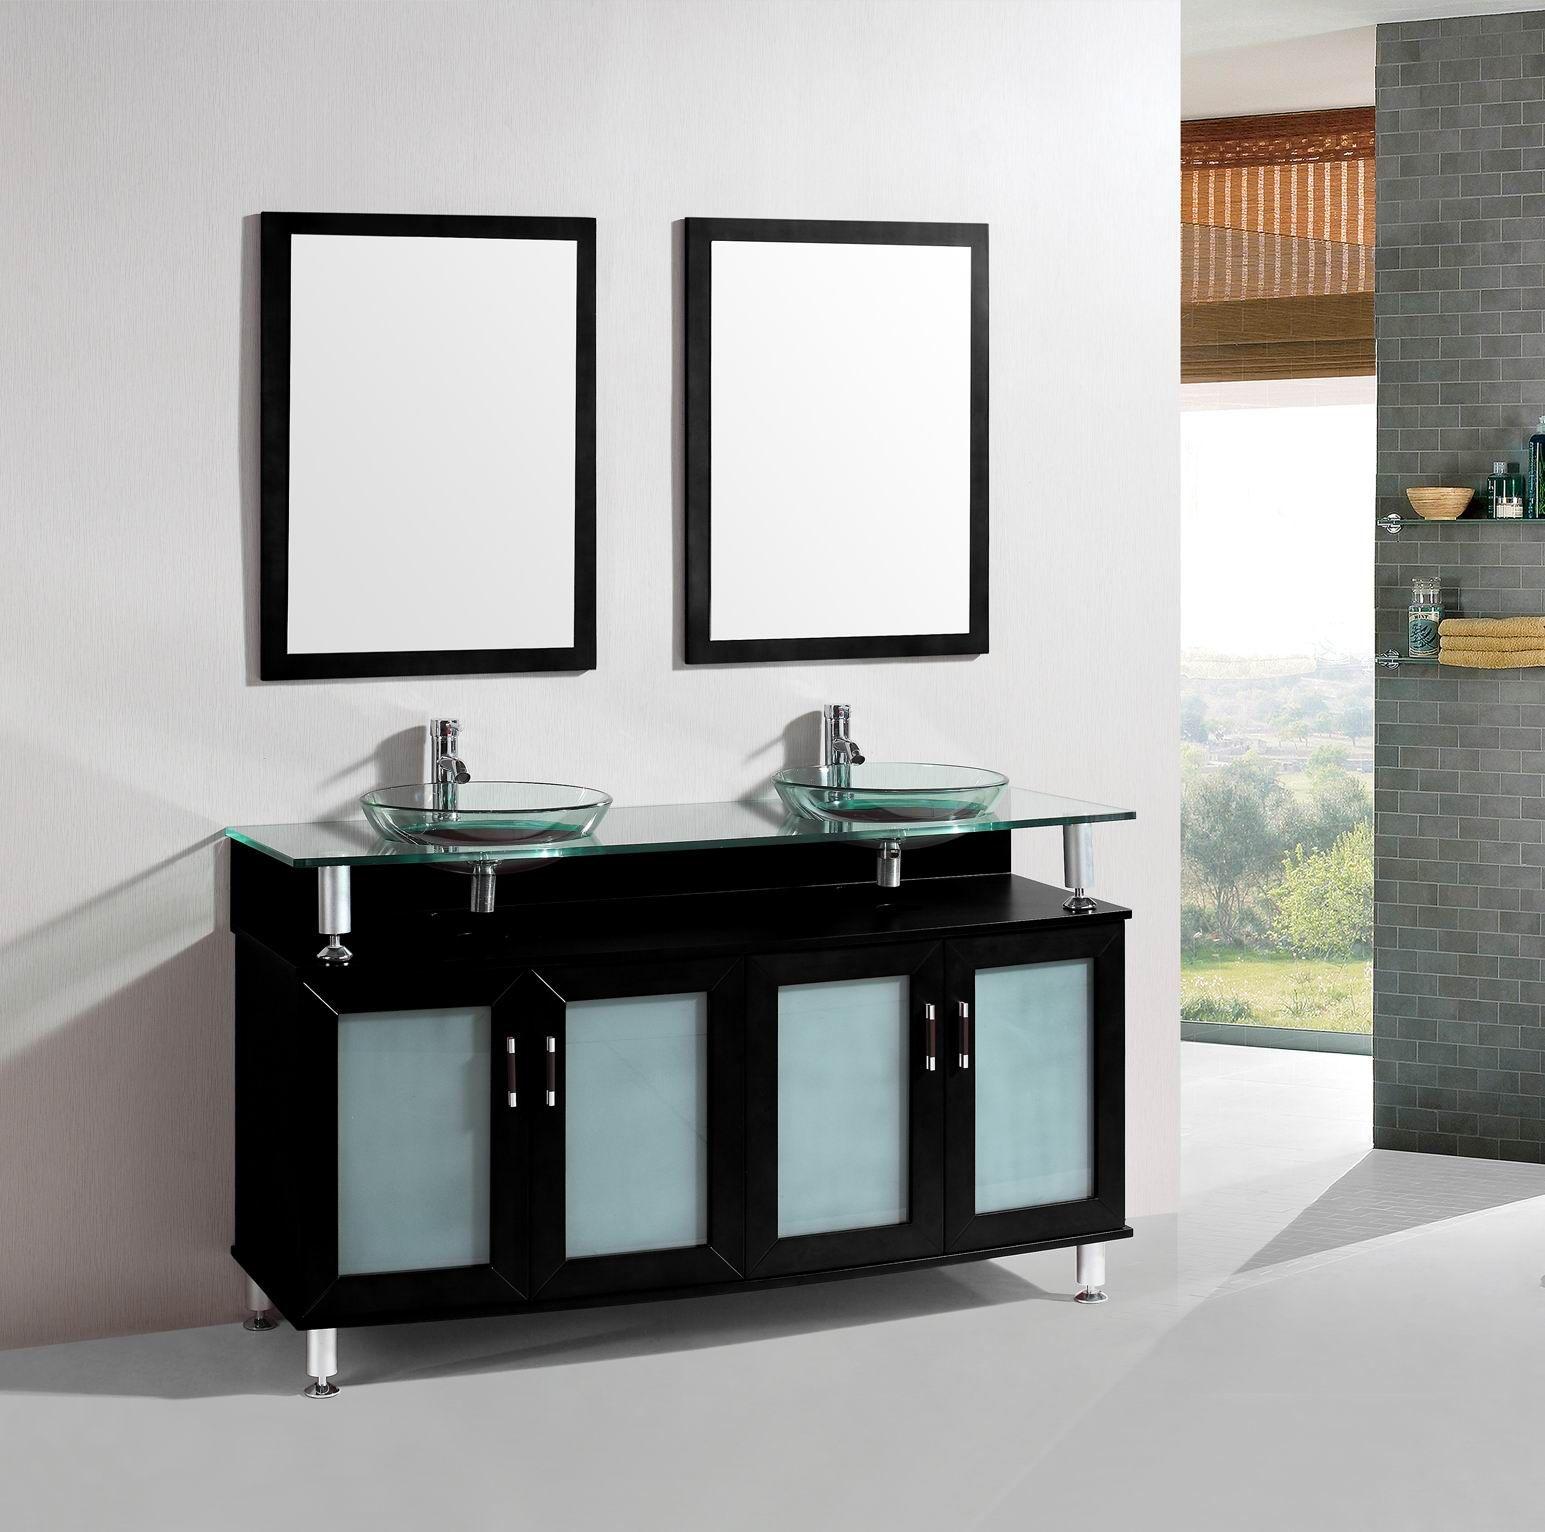 inch belvedere modern espresso brown double bathroom vanity w